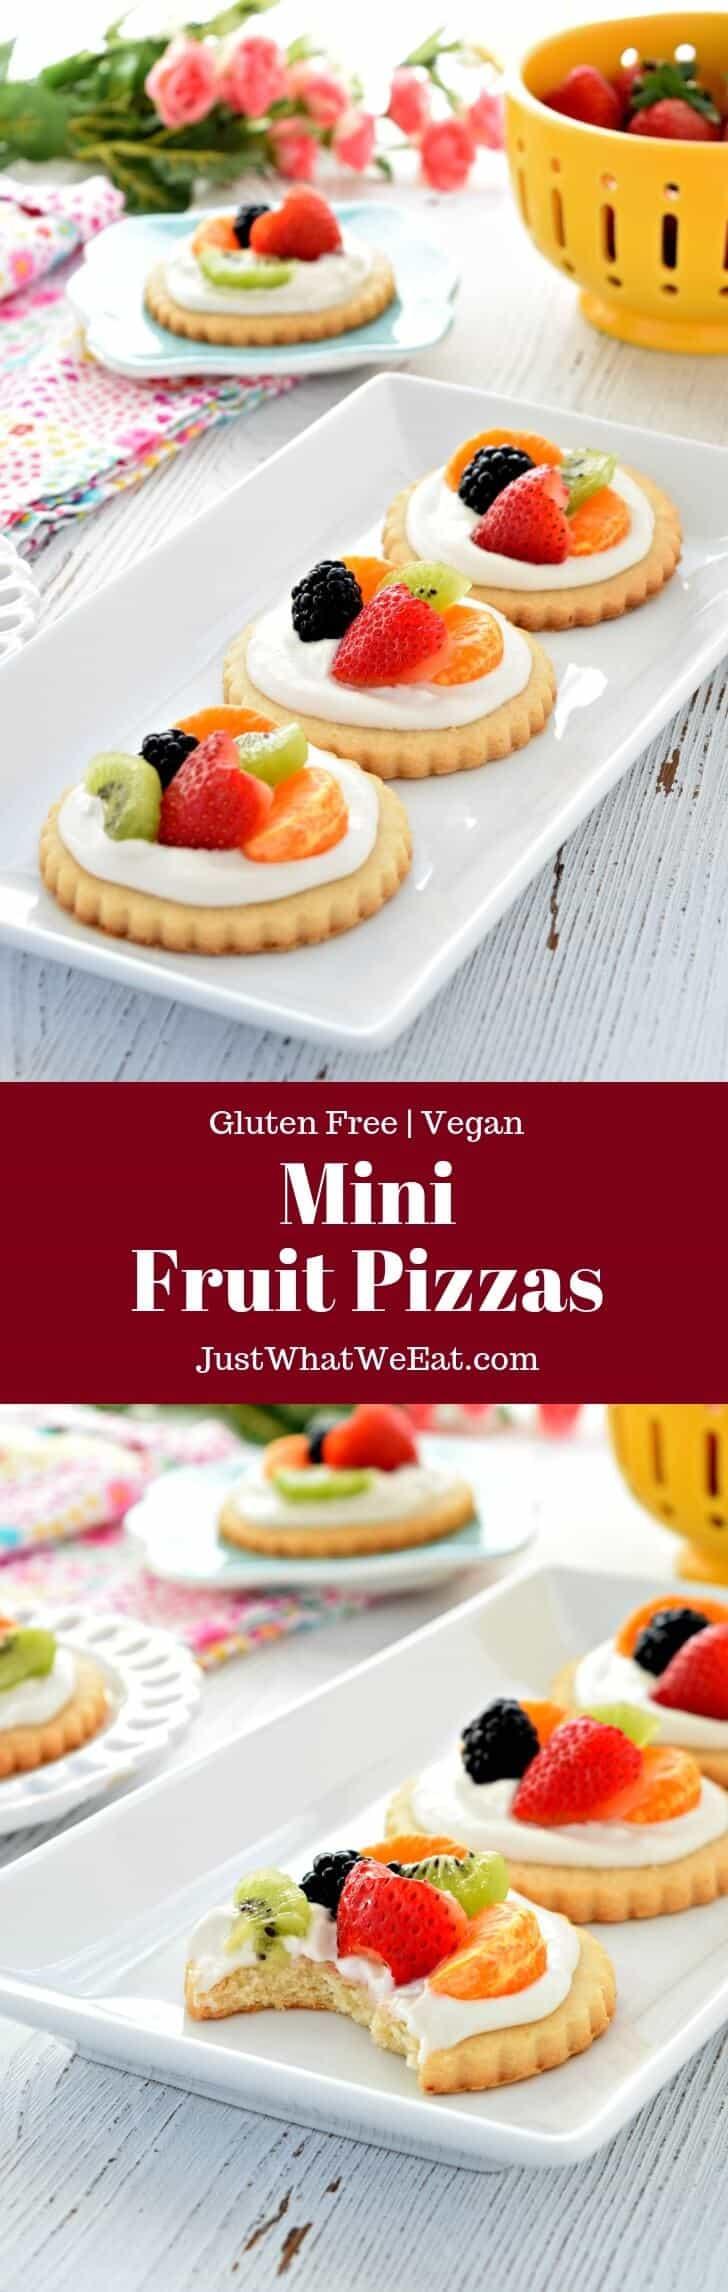 Gluten Free Vegan Dairy Free Mini Fruit Pizzas